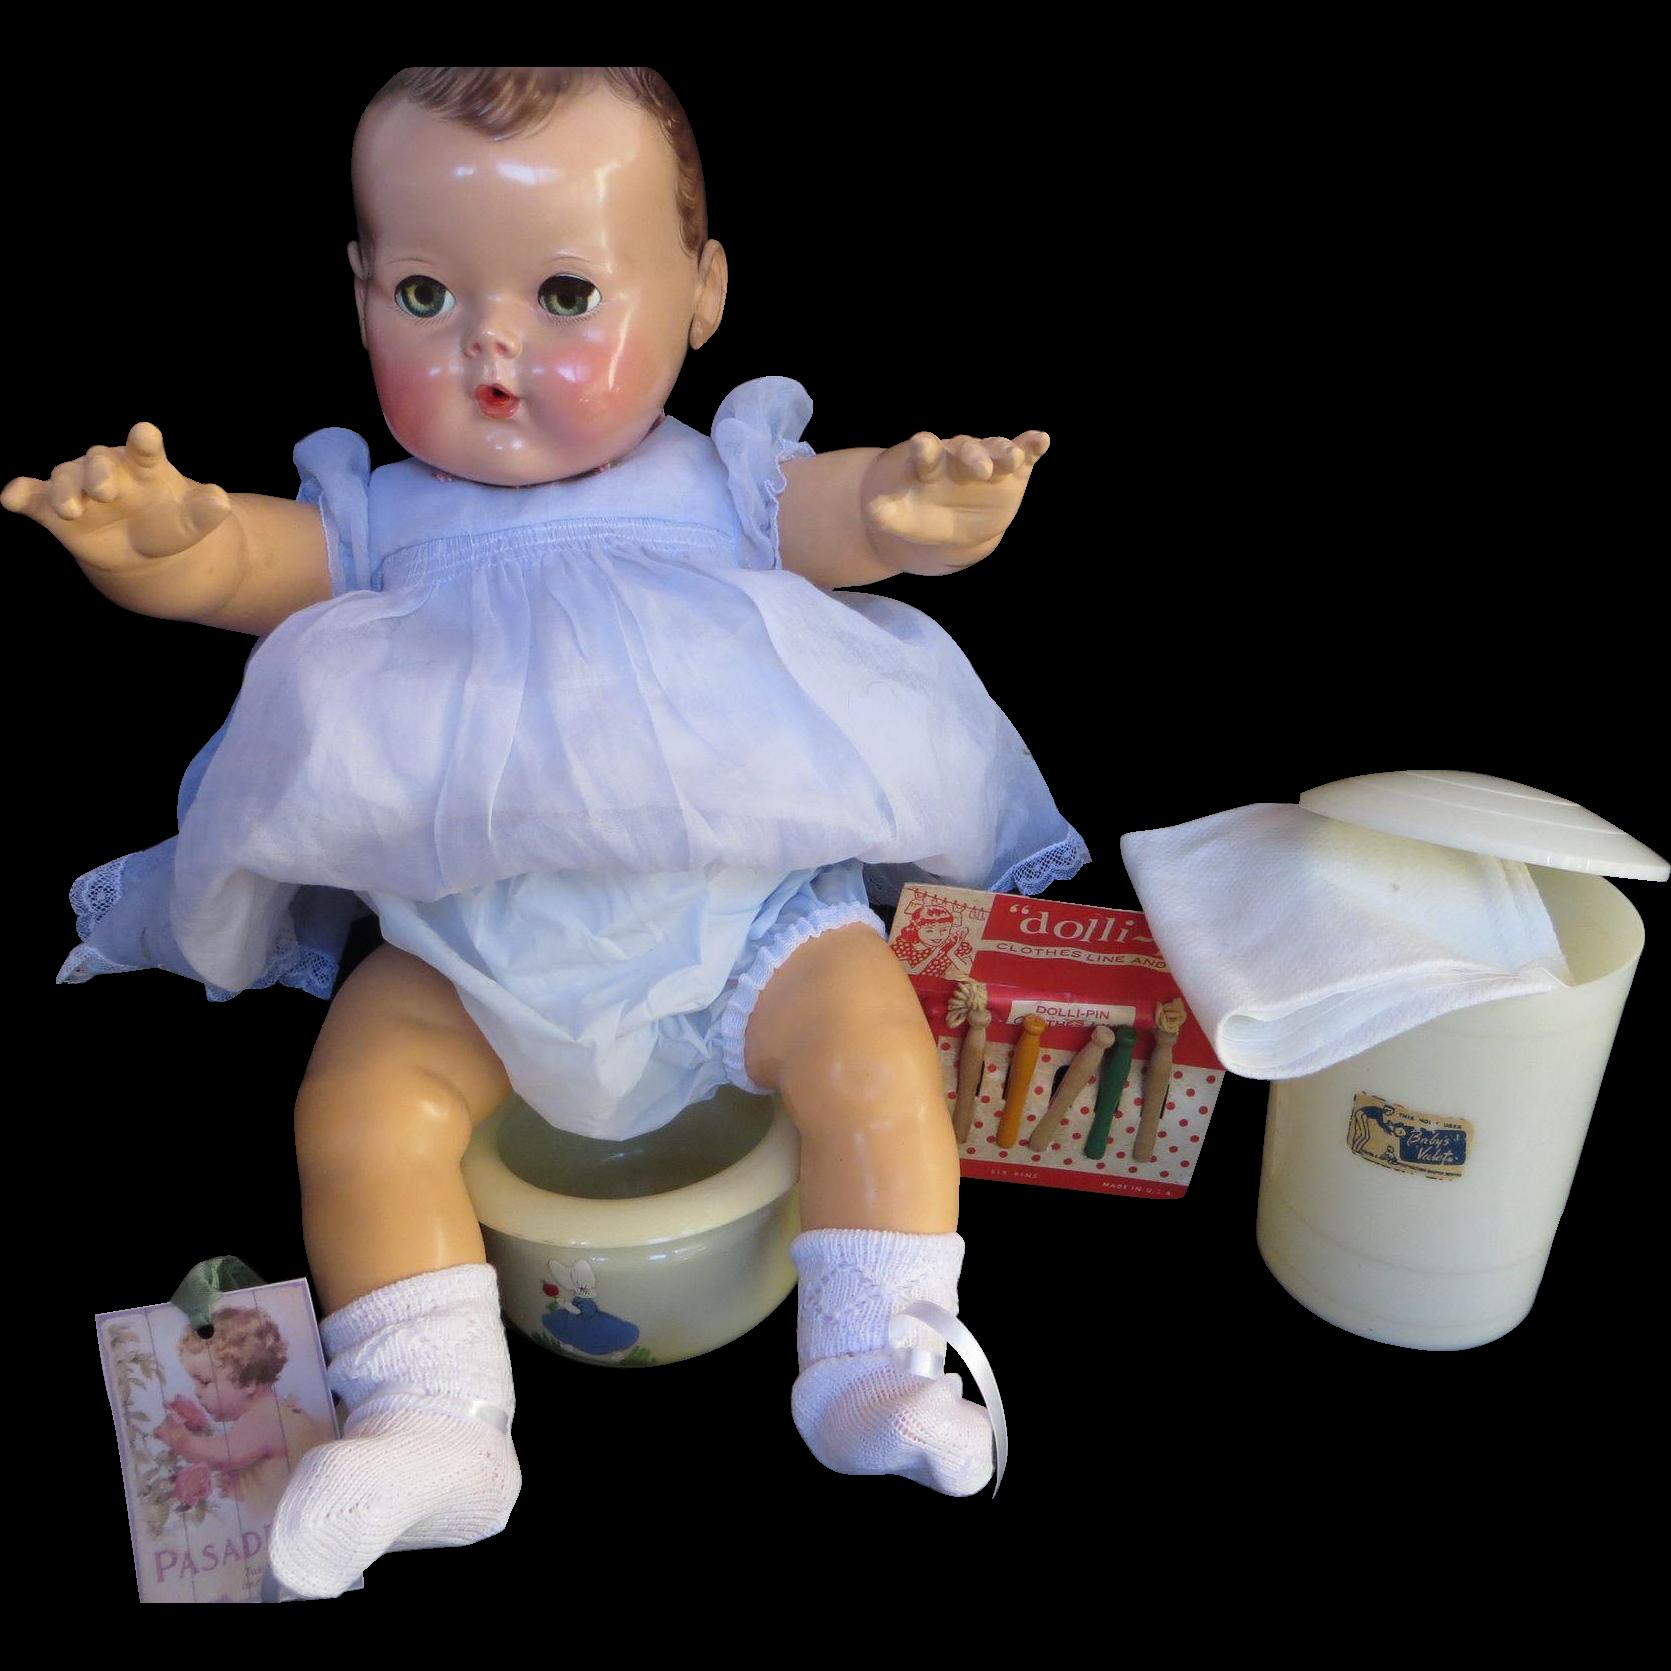 Vintage Toy Potty : Vintage effanbee dy dee doll quot rare diaper pail potty